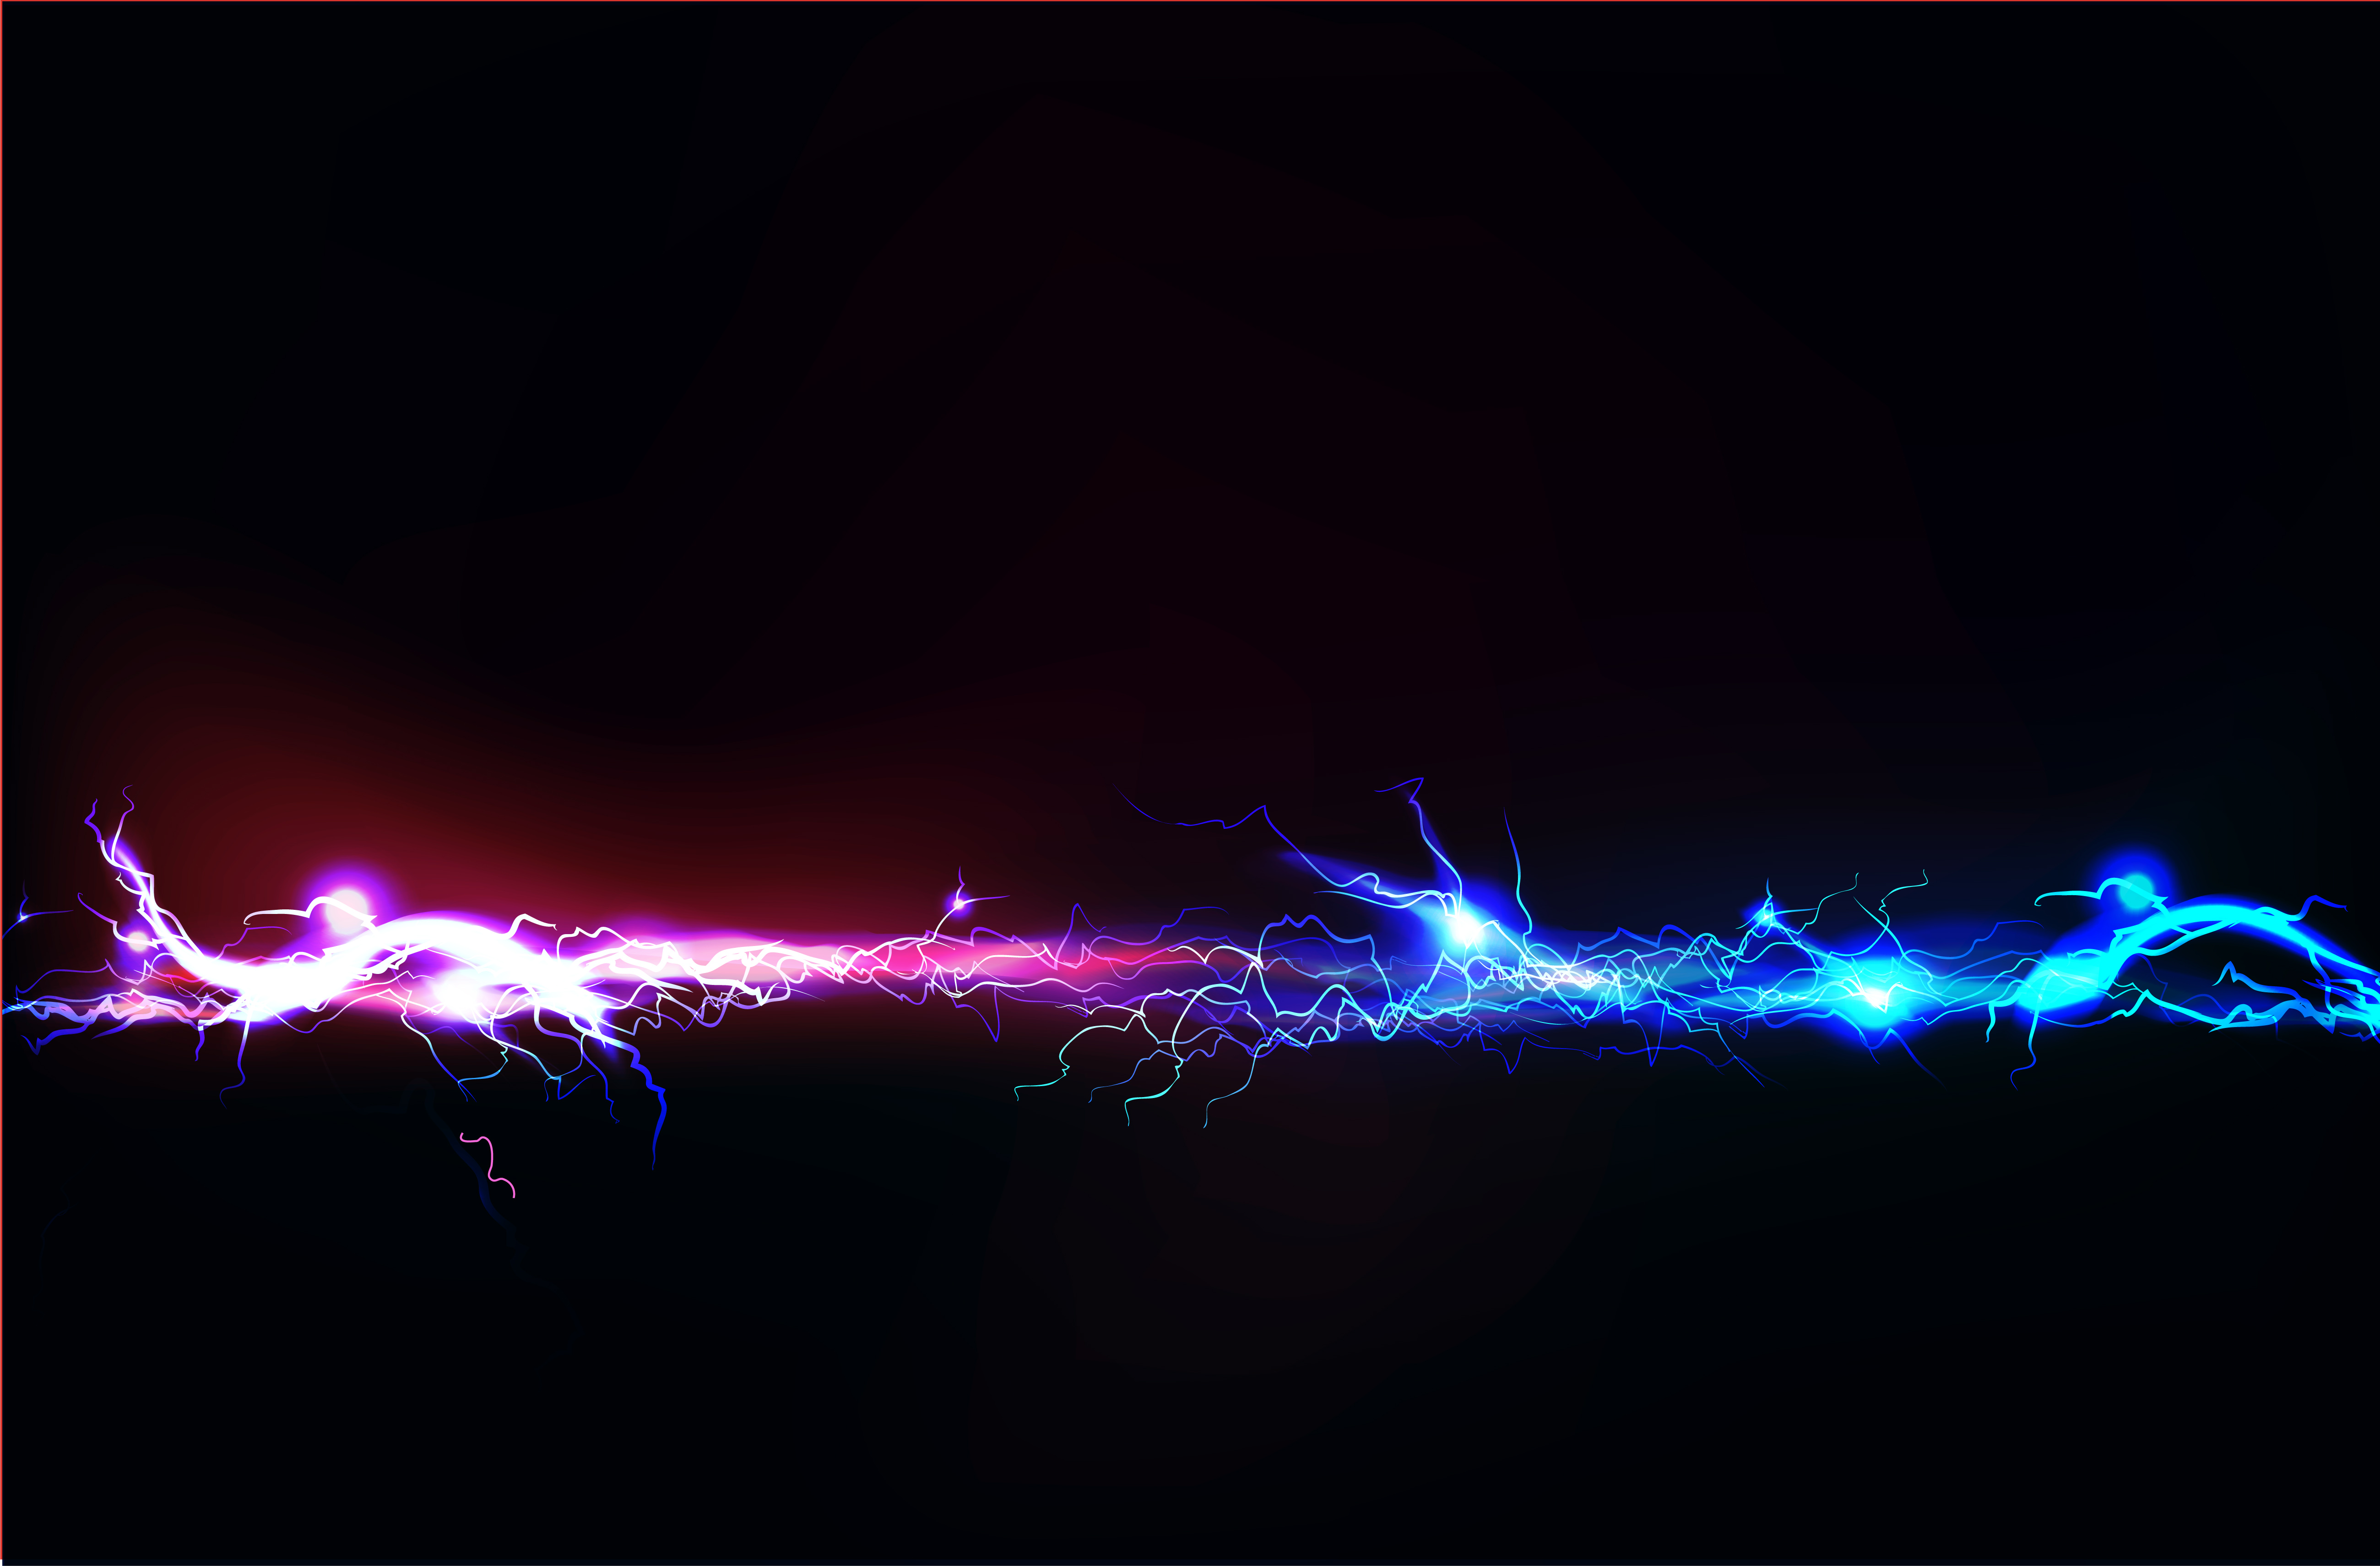 What Is the Gaslight Effect, Gaslighting